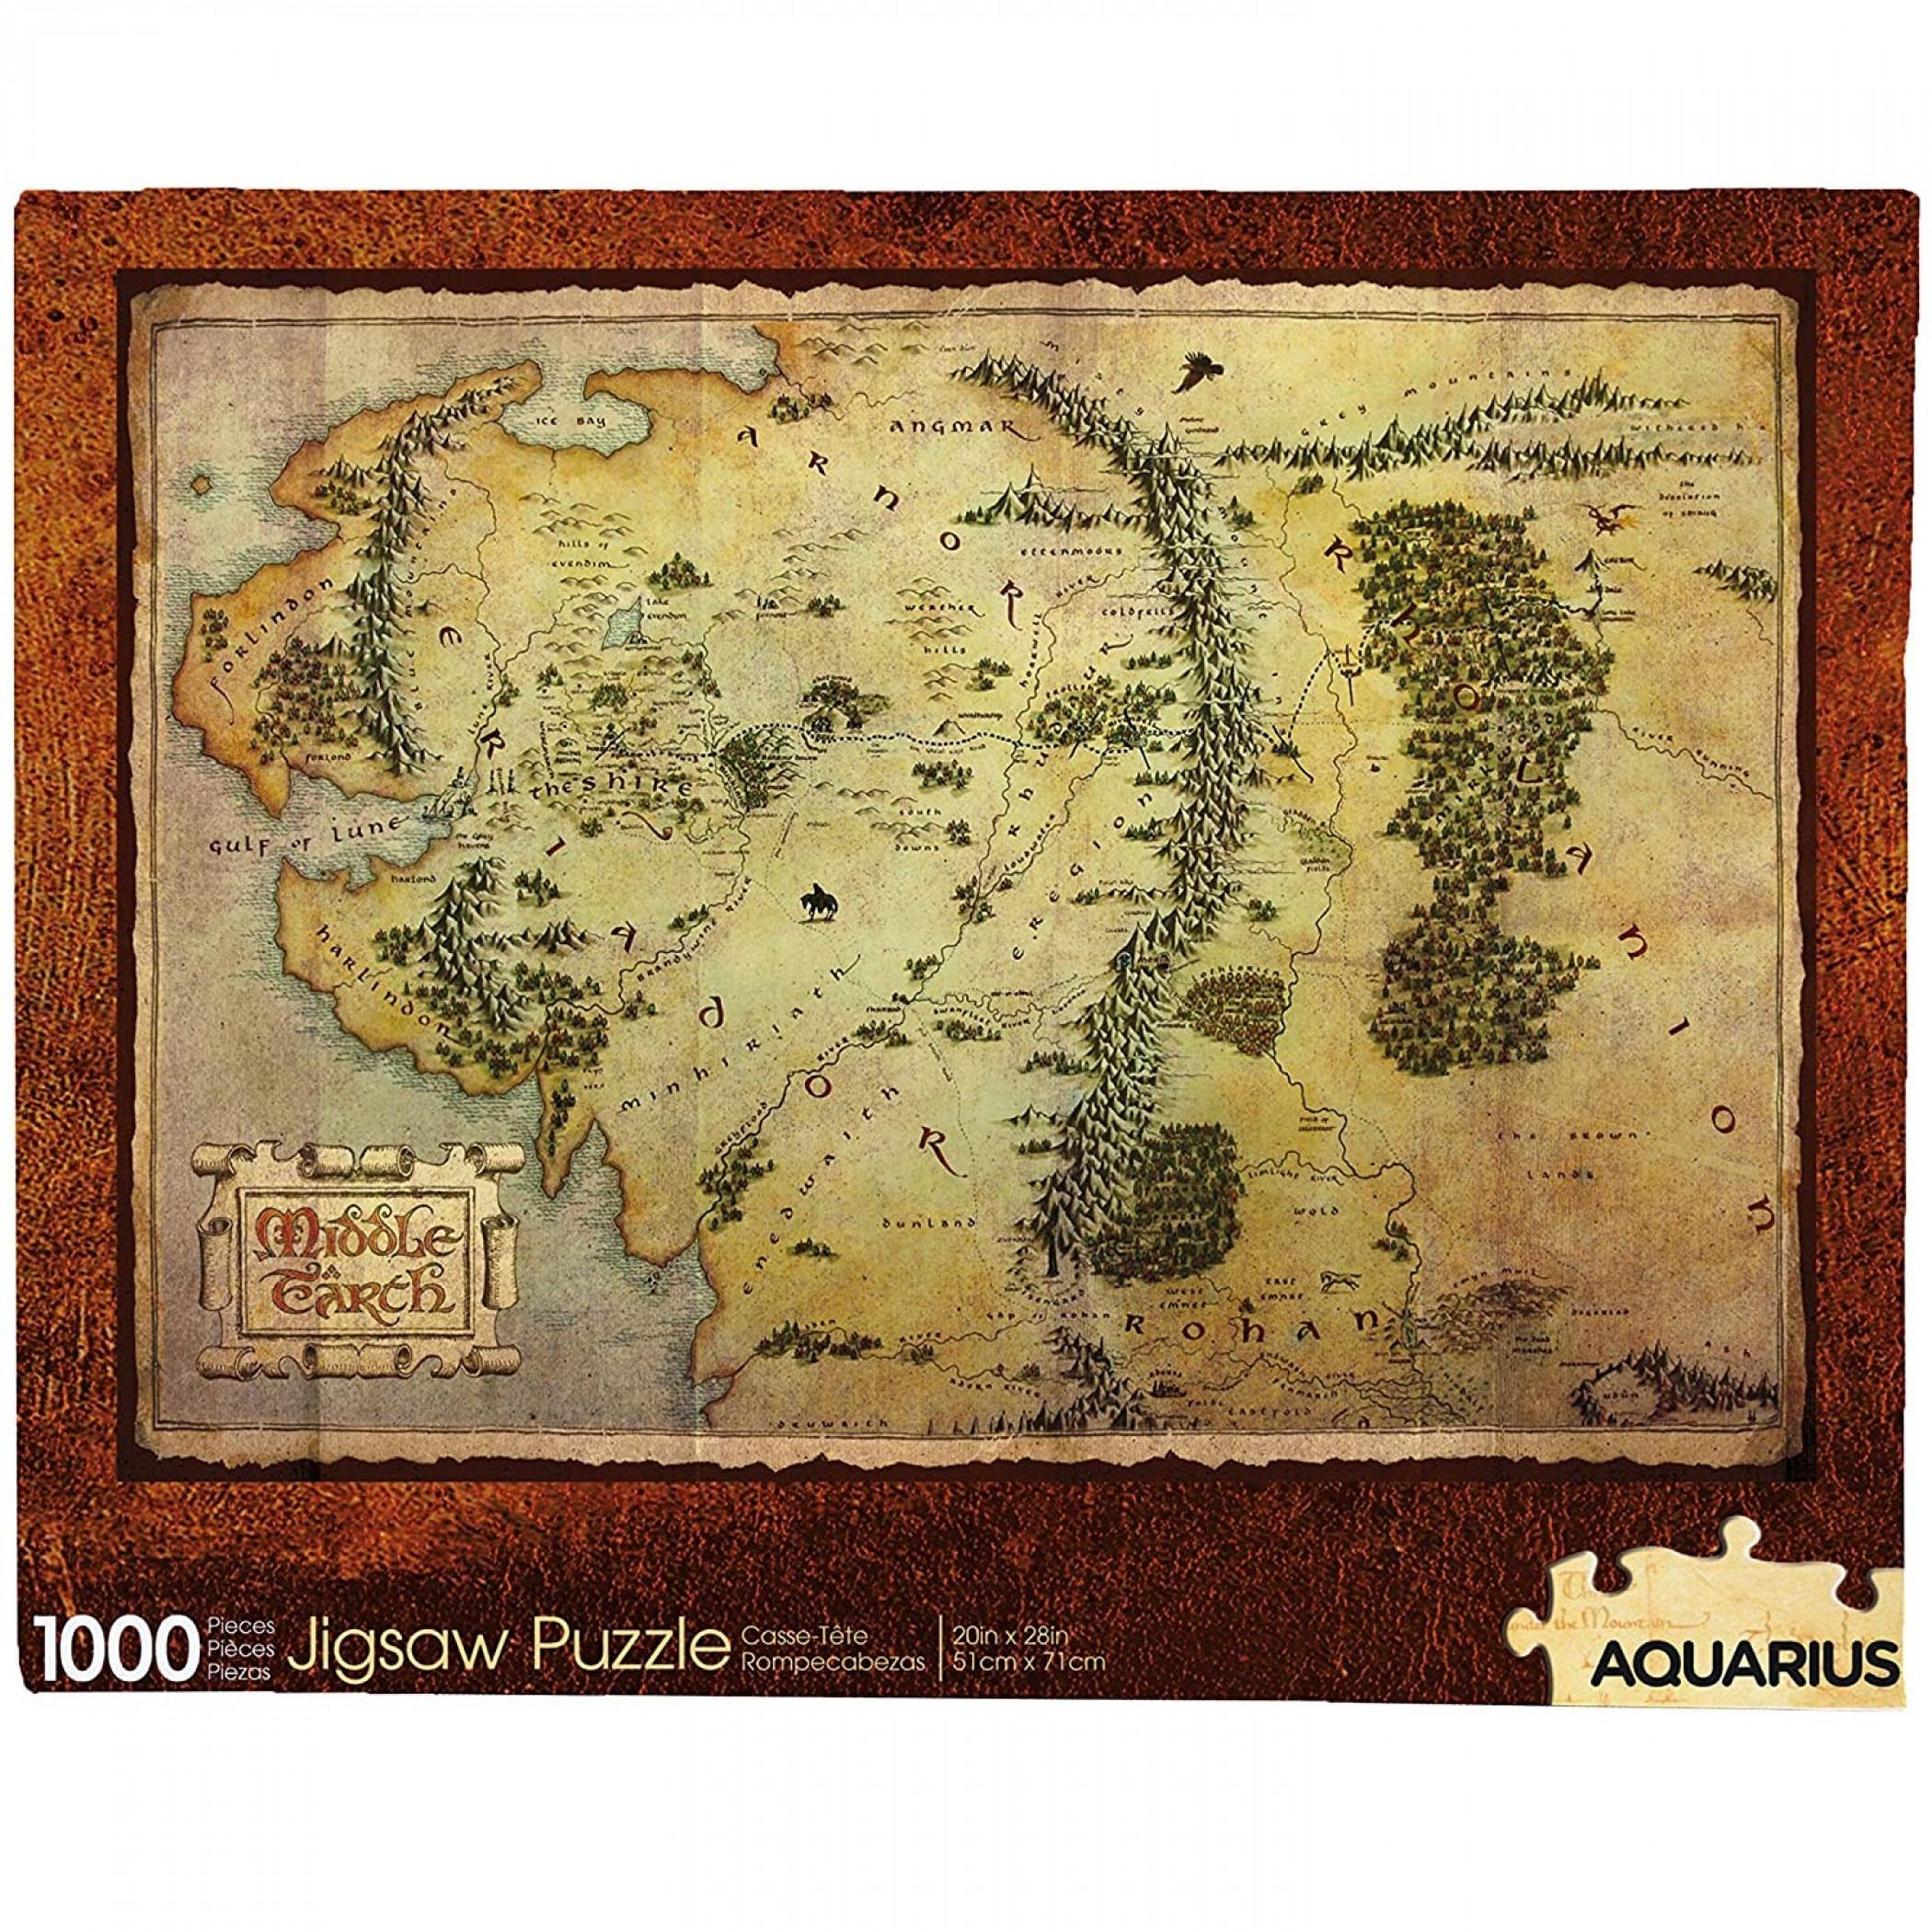 The Hobbit Map 1000 Piece Jigsaw Puzzle